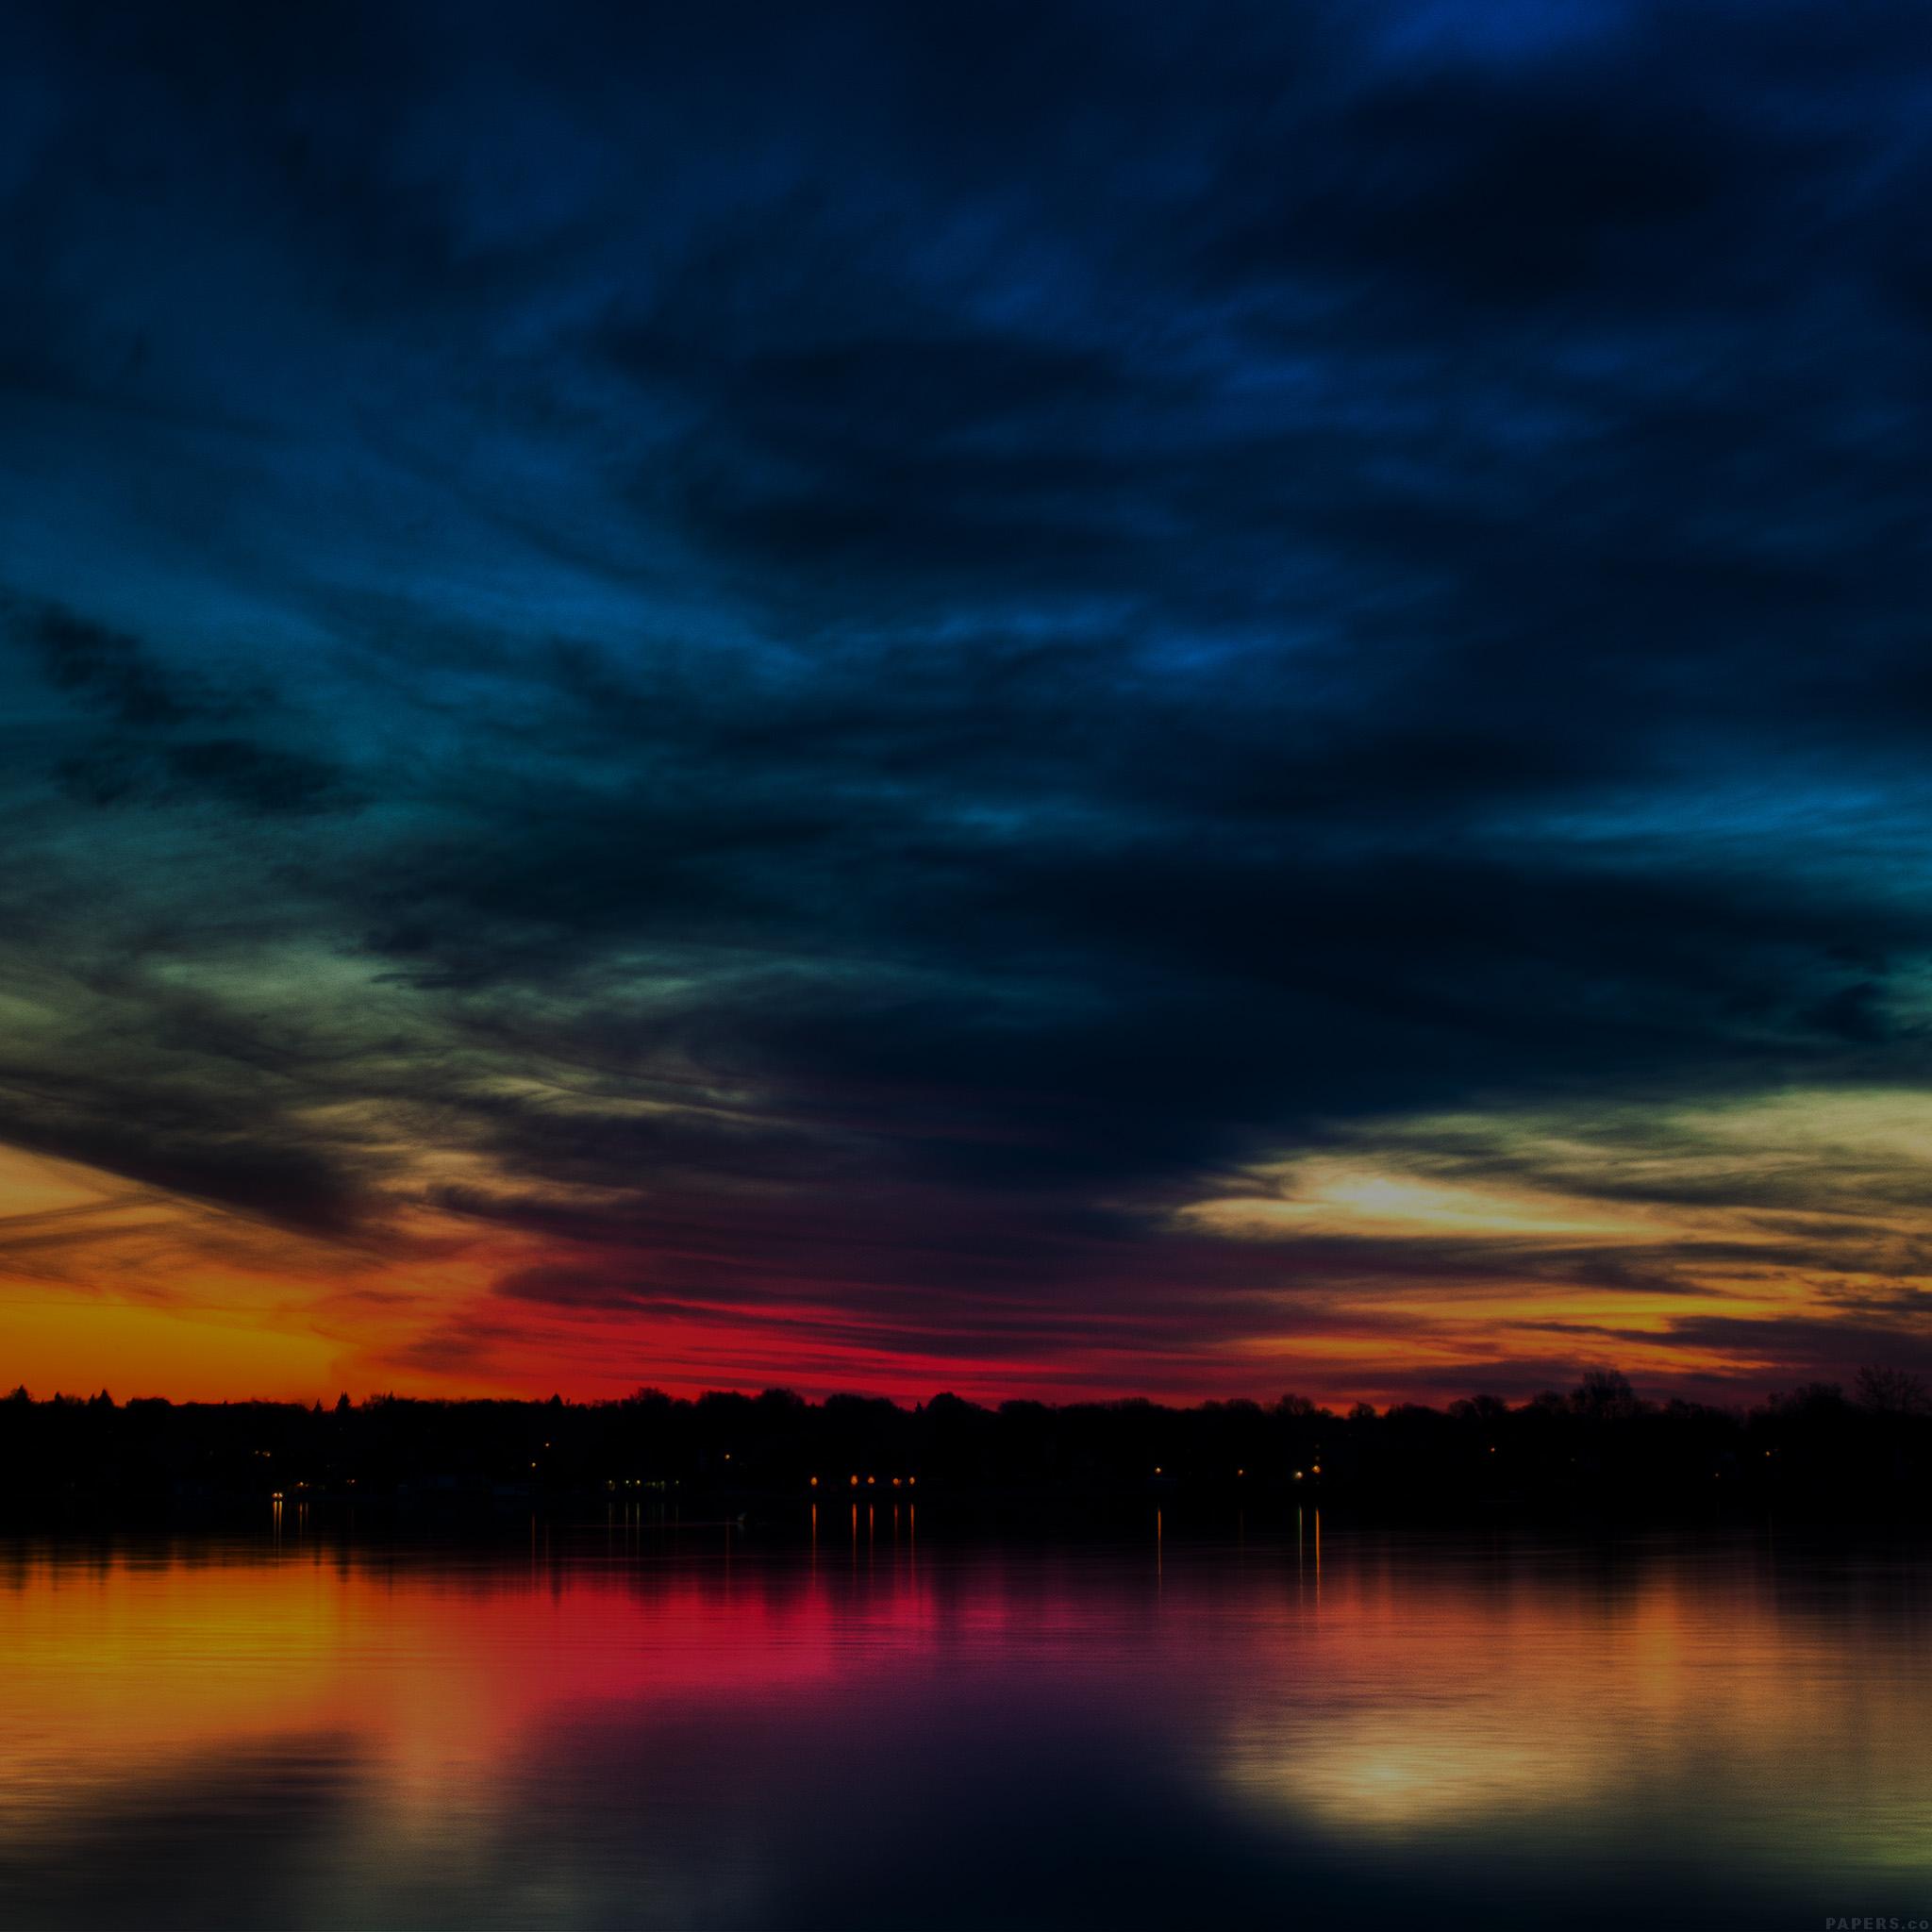 Batman Wallpaper Iphone X Mj80 Rainbow In The Sky Dark Lake Sea Nature Wallpaper